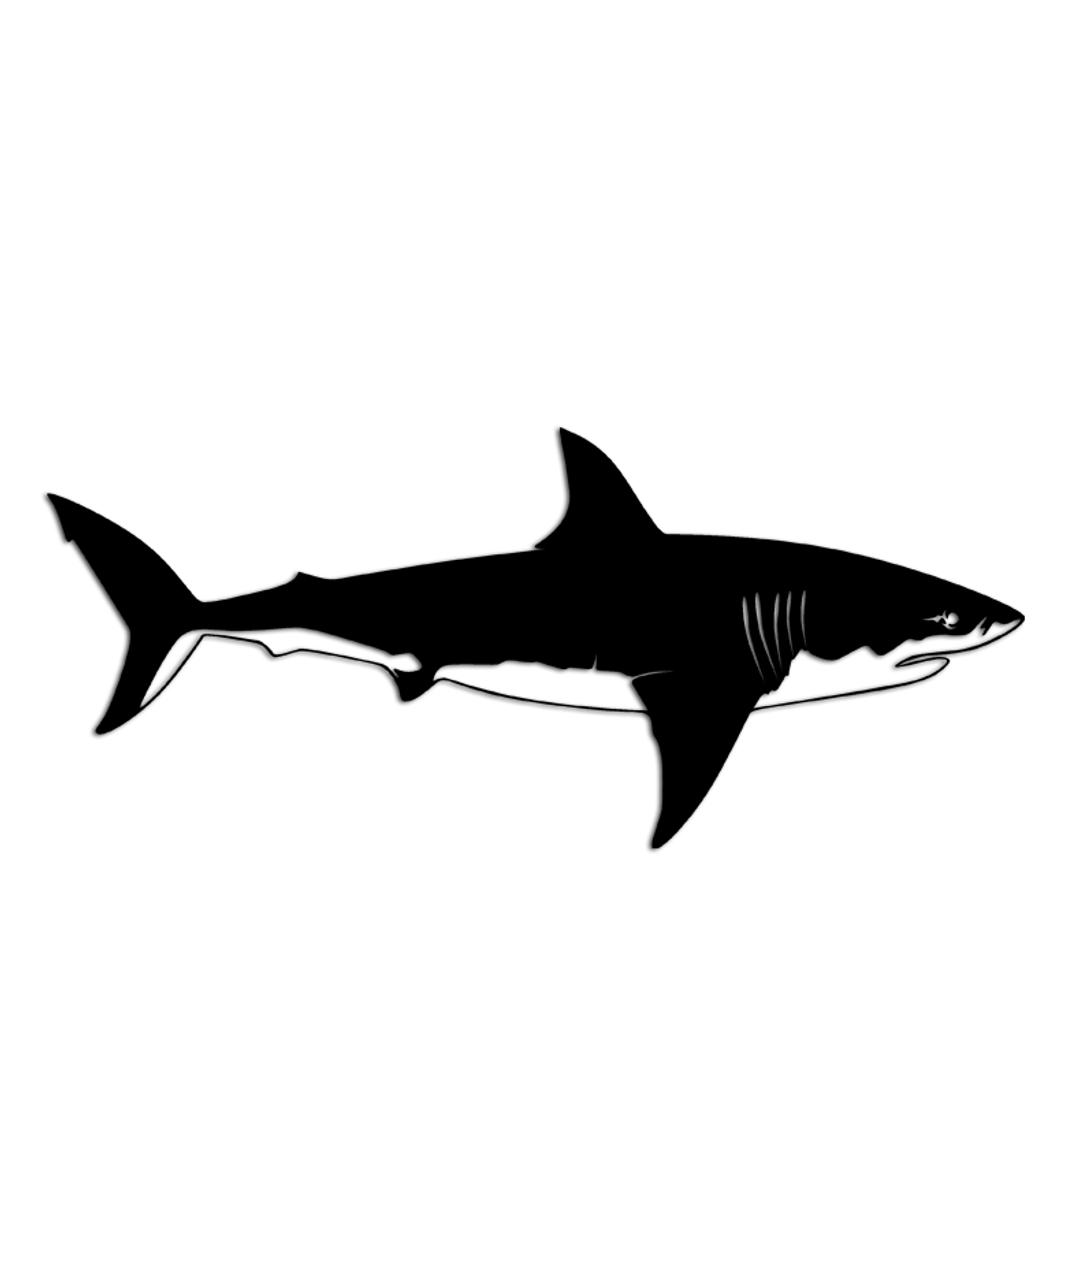 Brand-new Great White Shark Profile Sticker - Aftershock Decals CU33